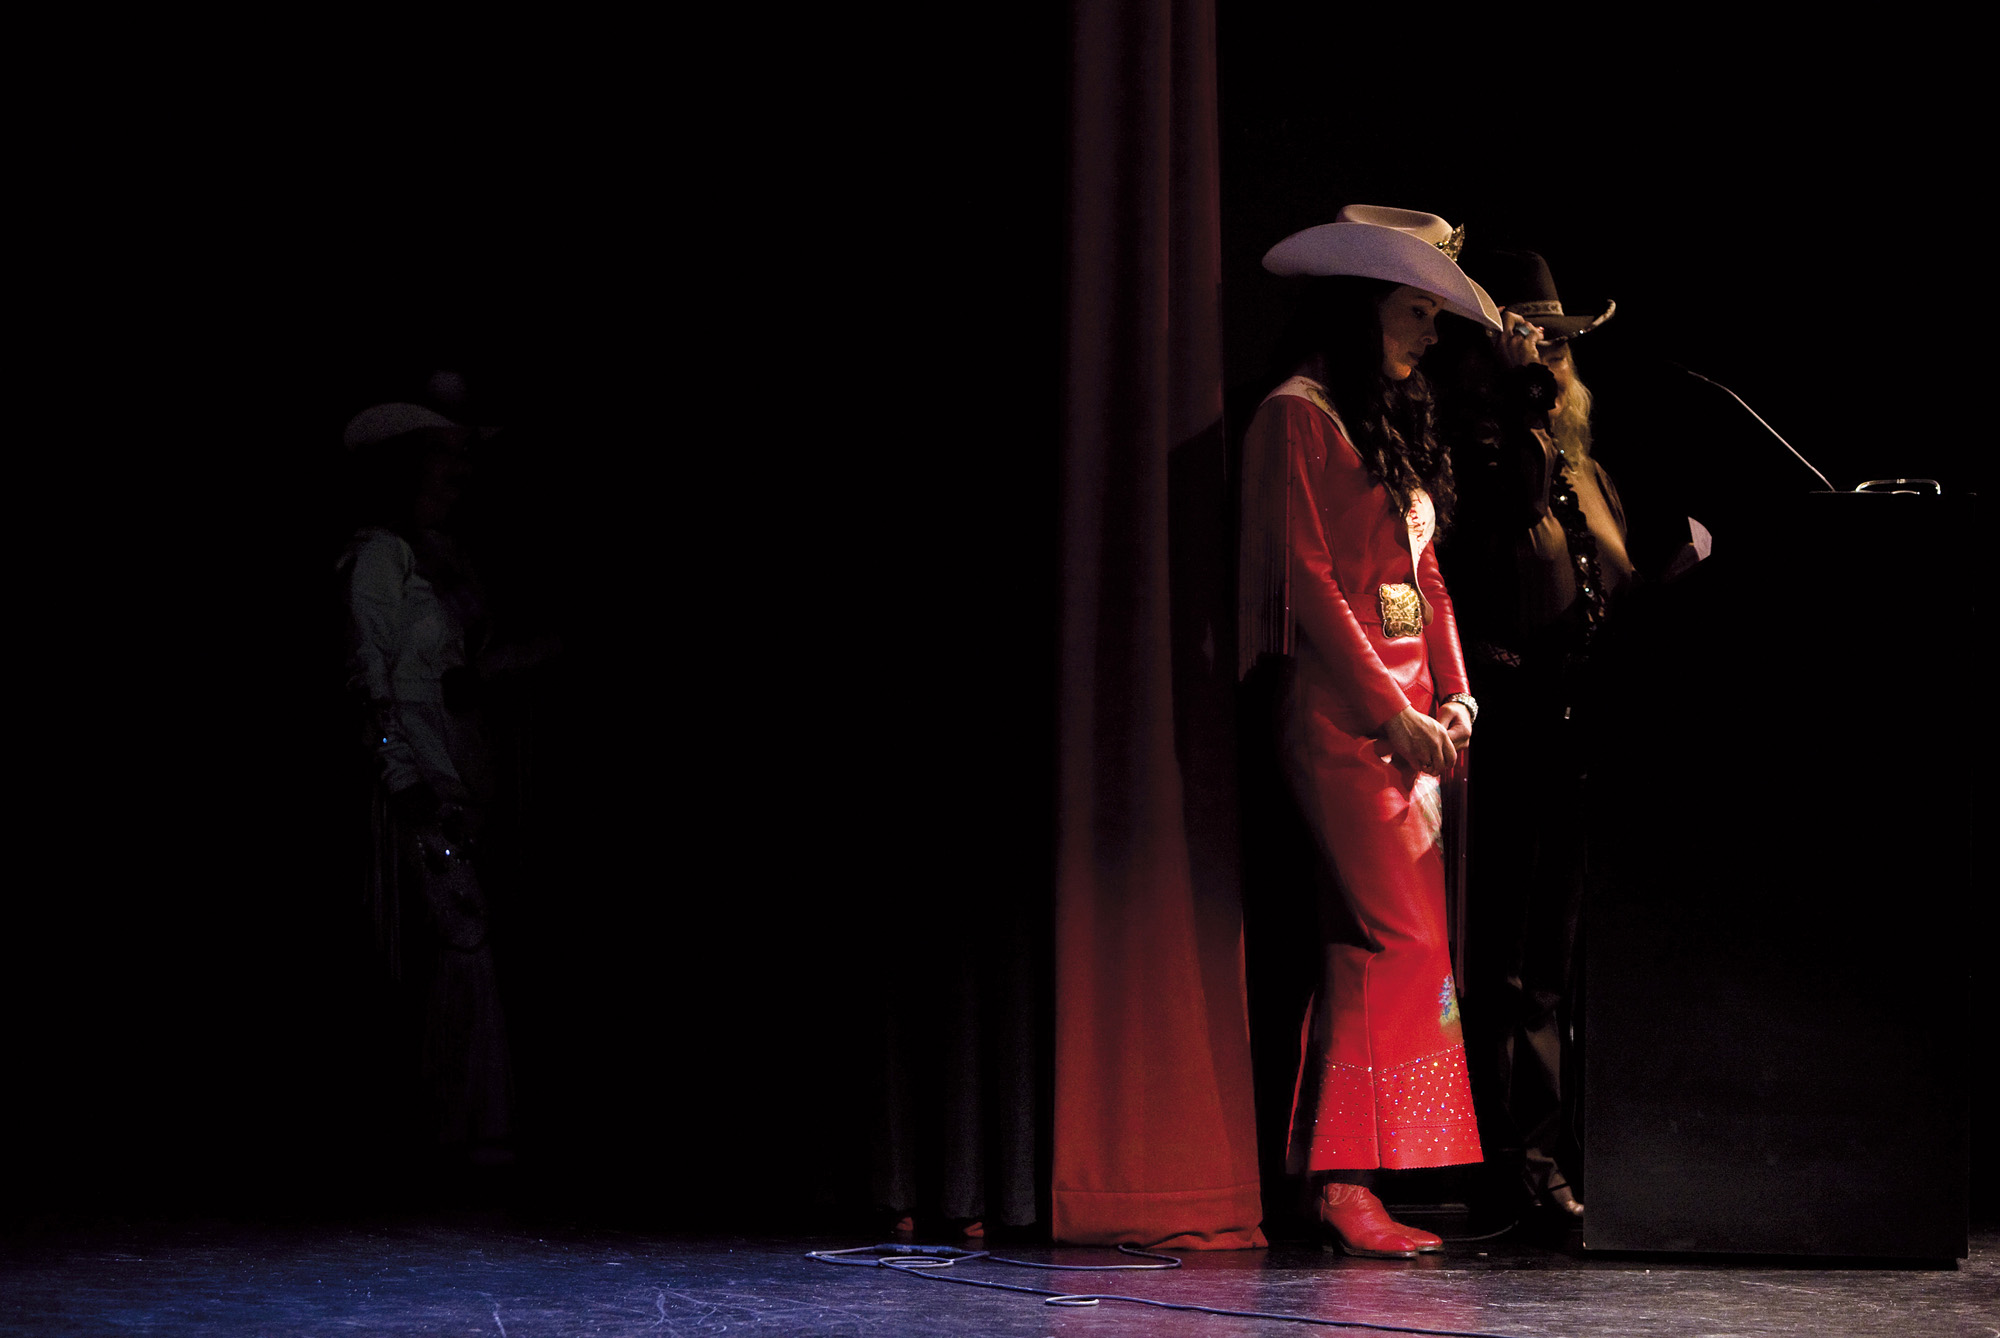 Cowgirl_10.jpg